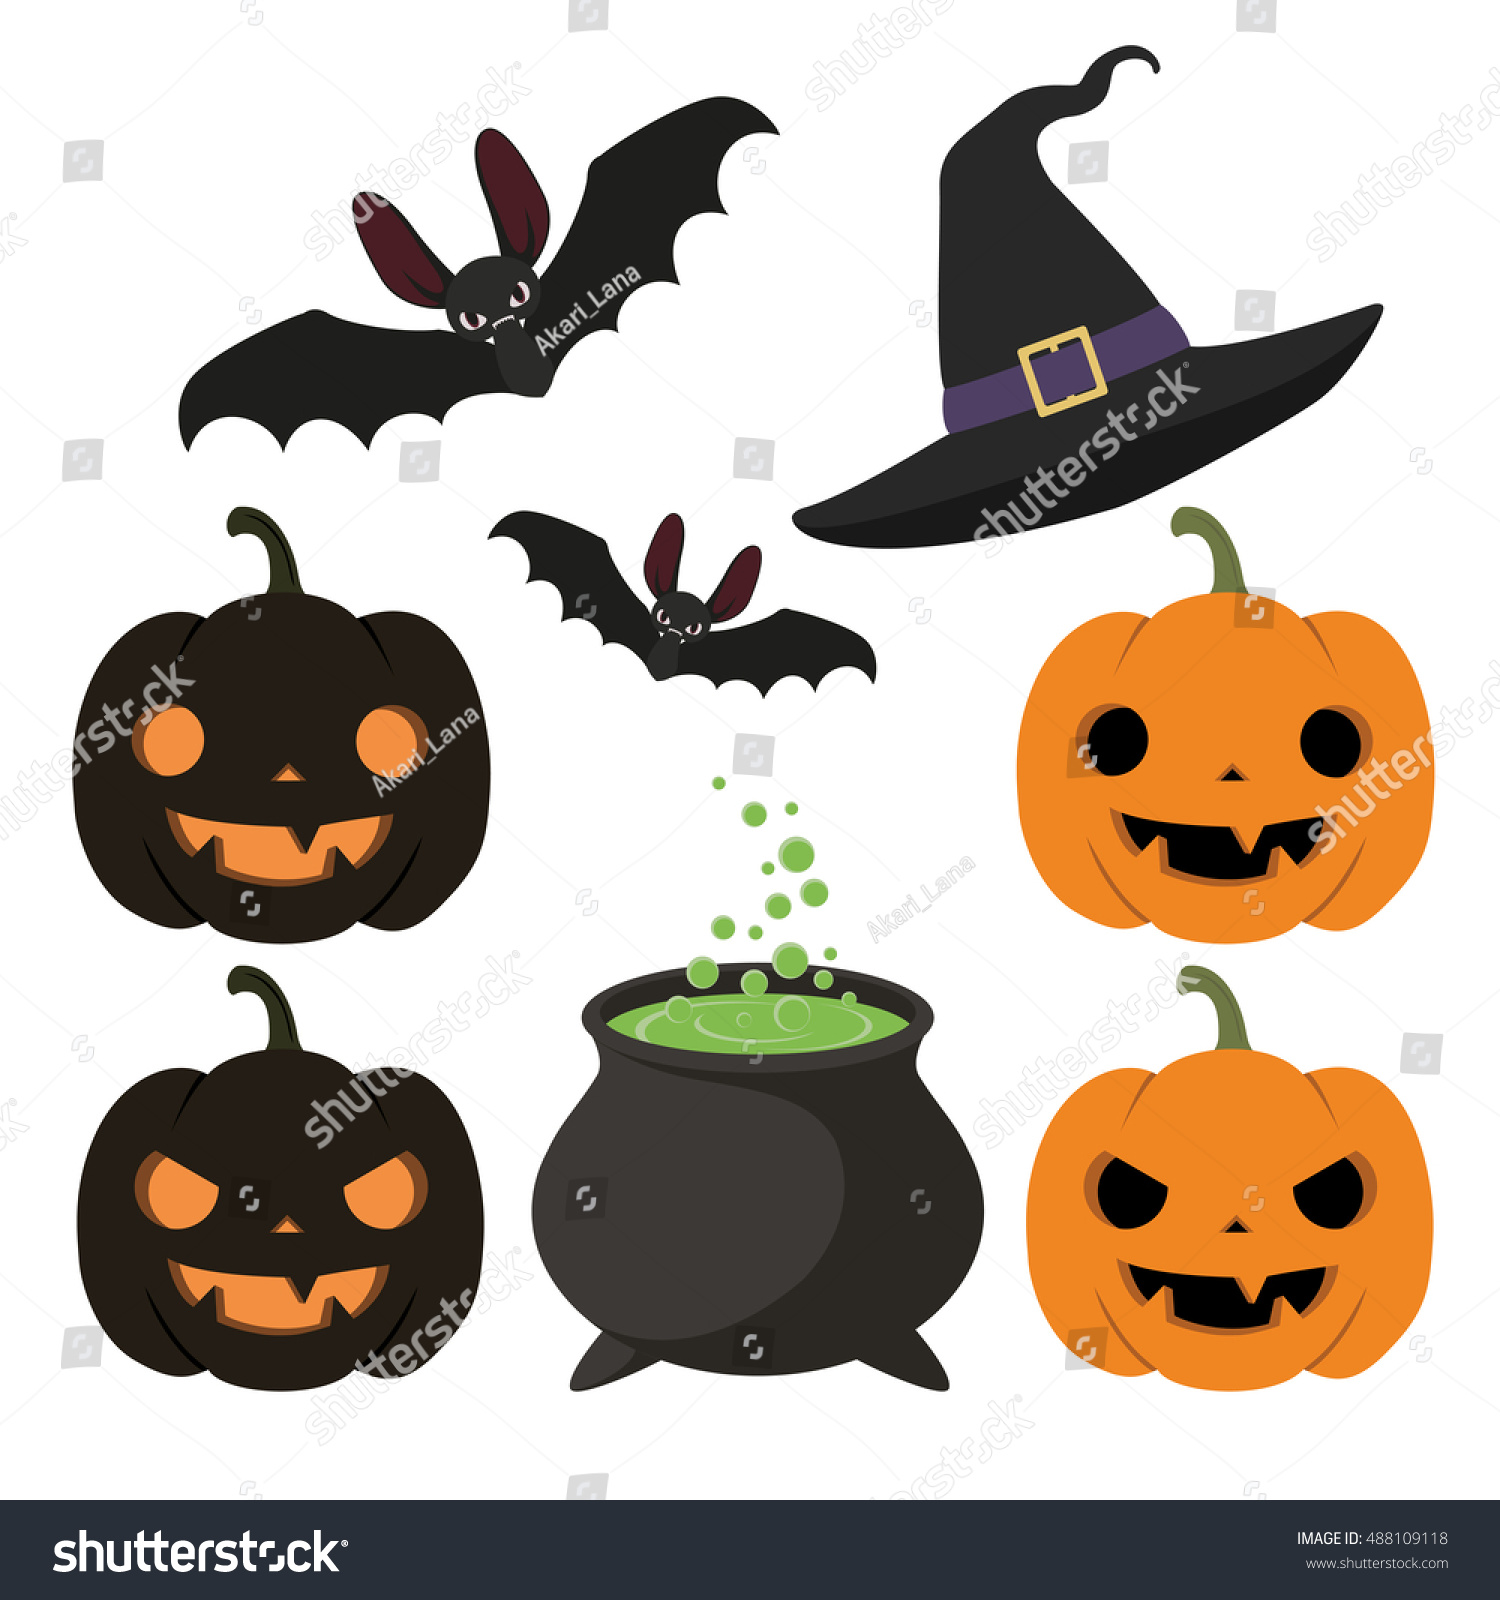 set of halloween items hat bat cauldron with potion pumpkin - Halloween Items